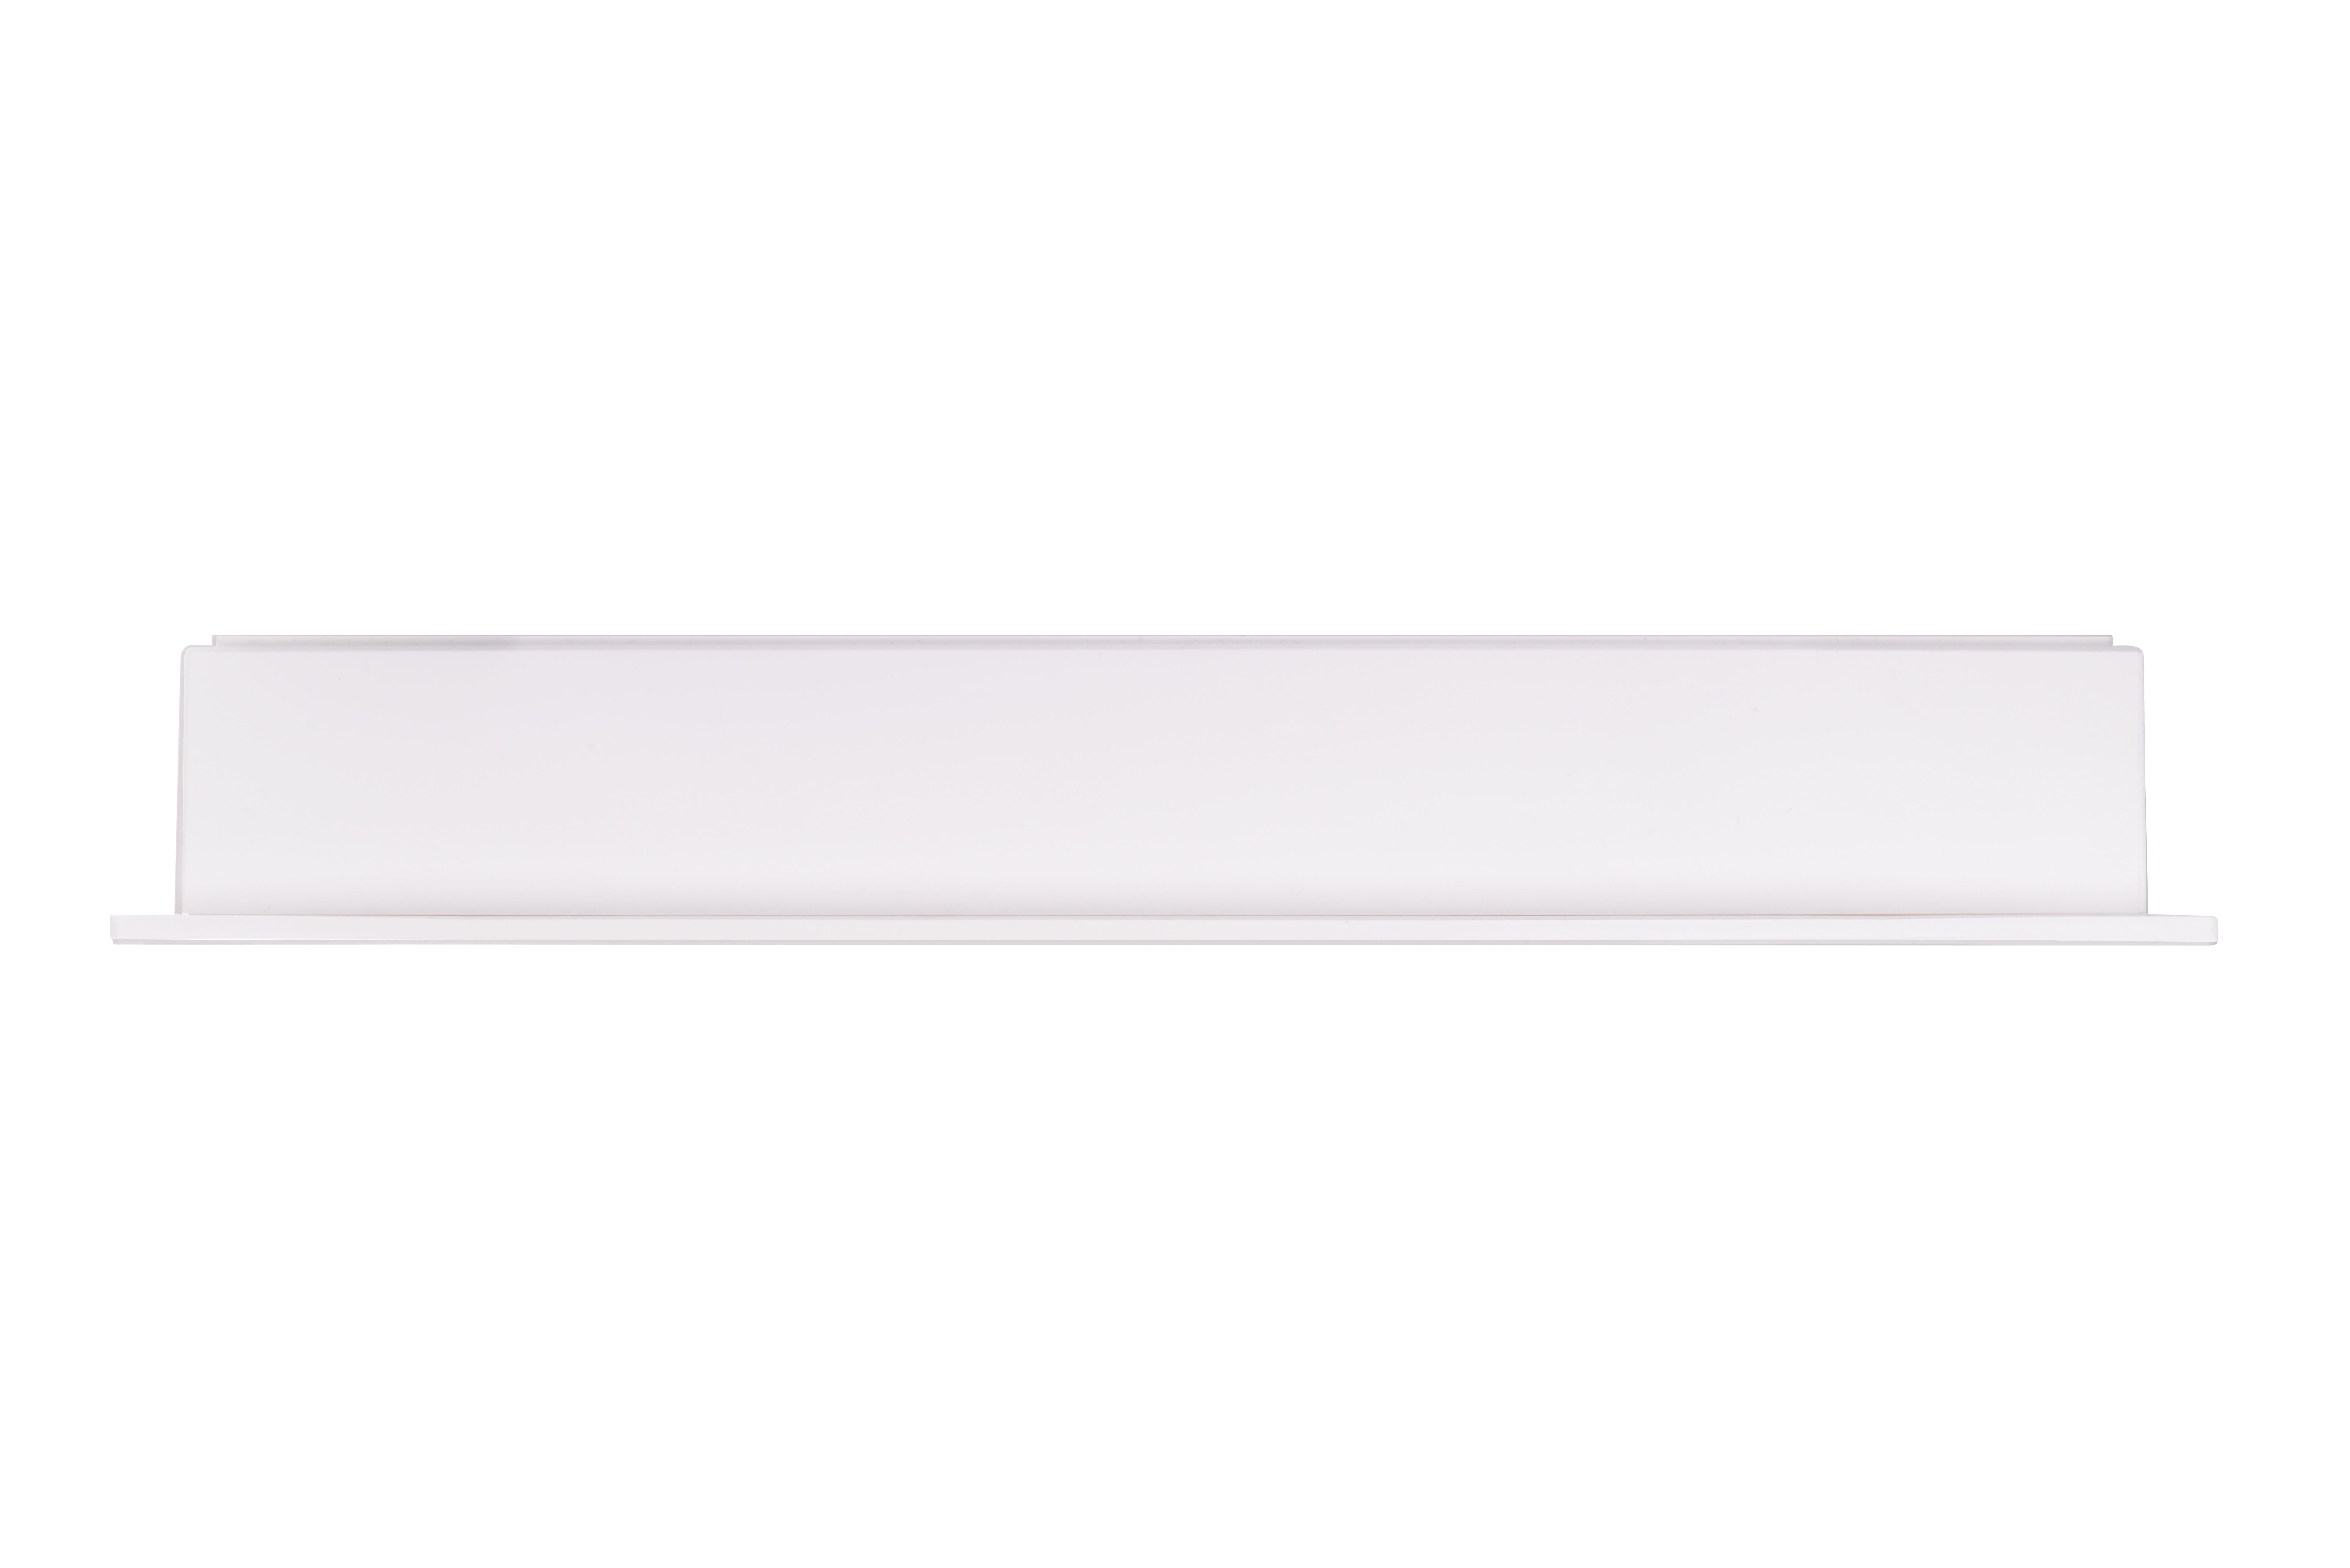 Lampa emergenta led Intelight 94769   3h nementinut test automat 5